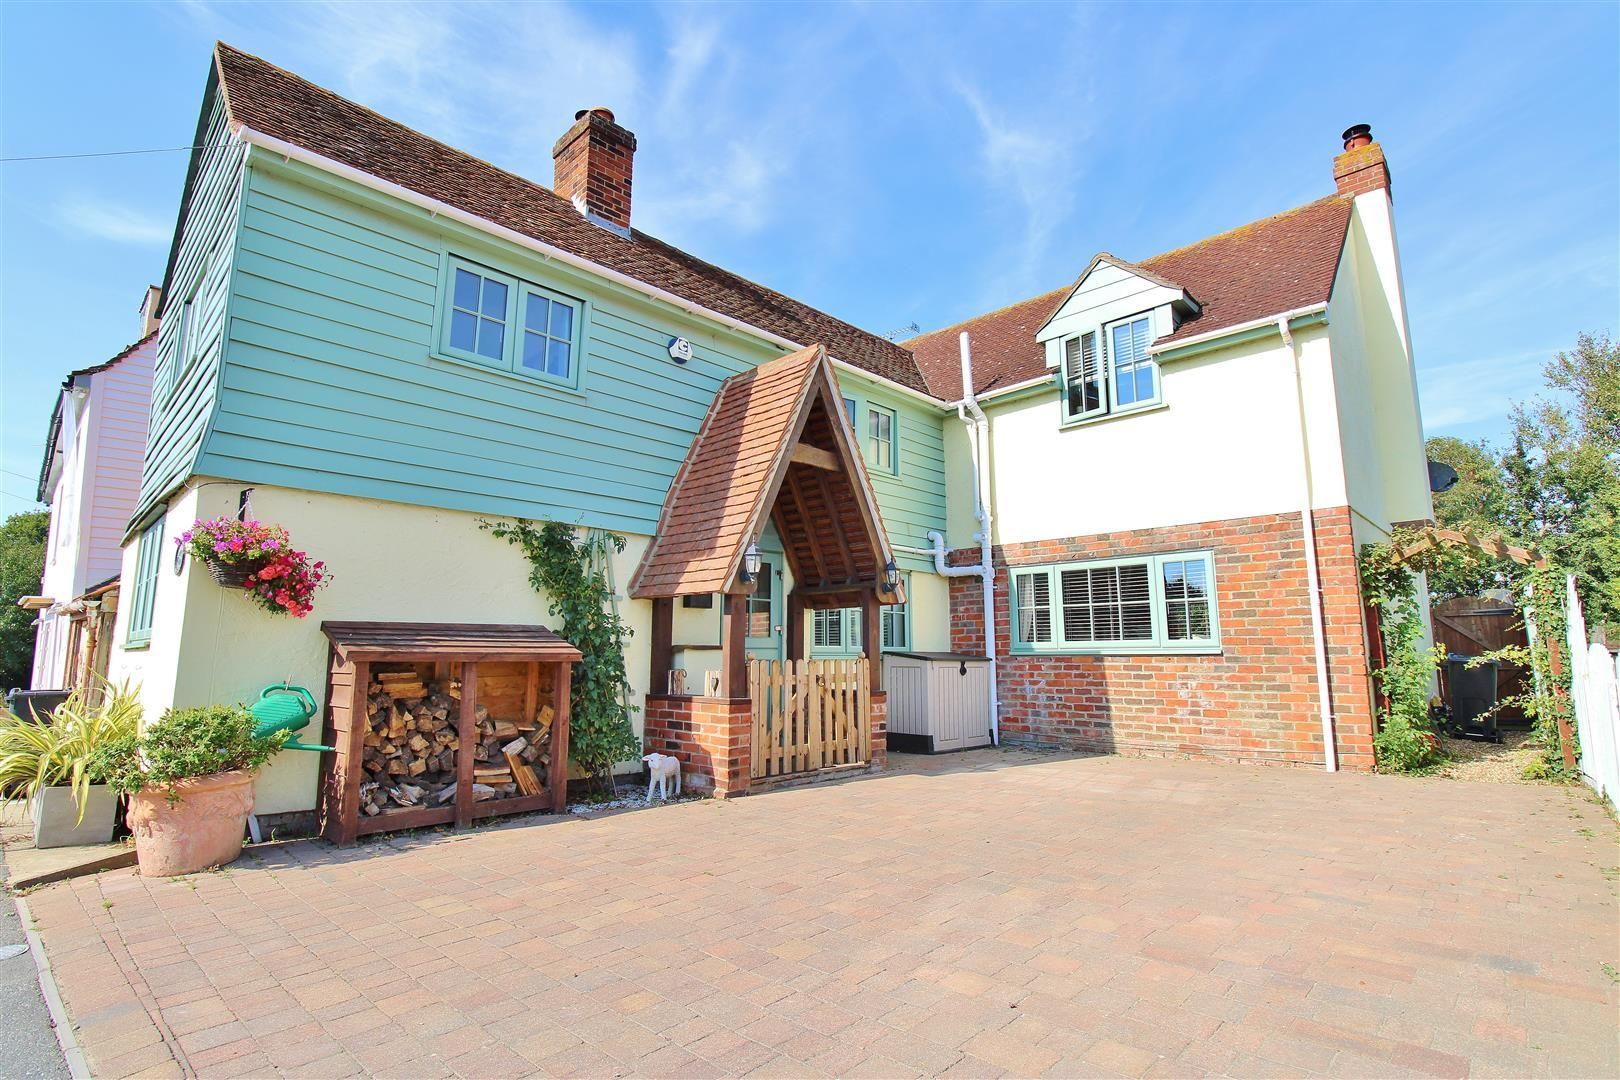 Property photo 1 of 36. Img_5078.Jpg